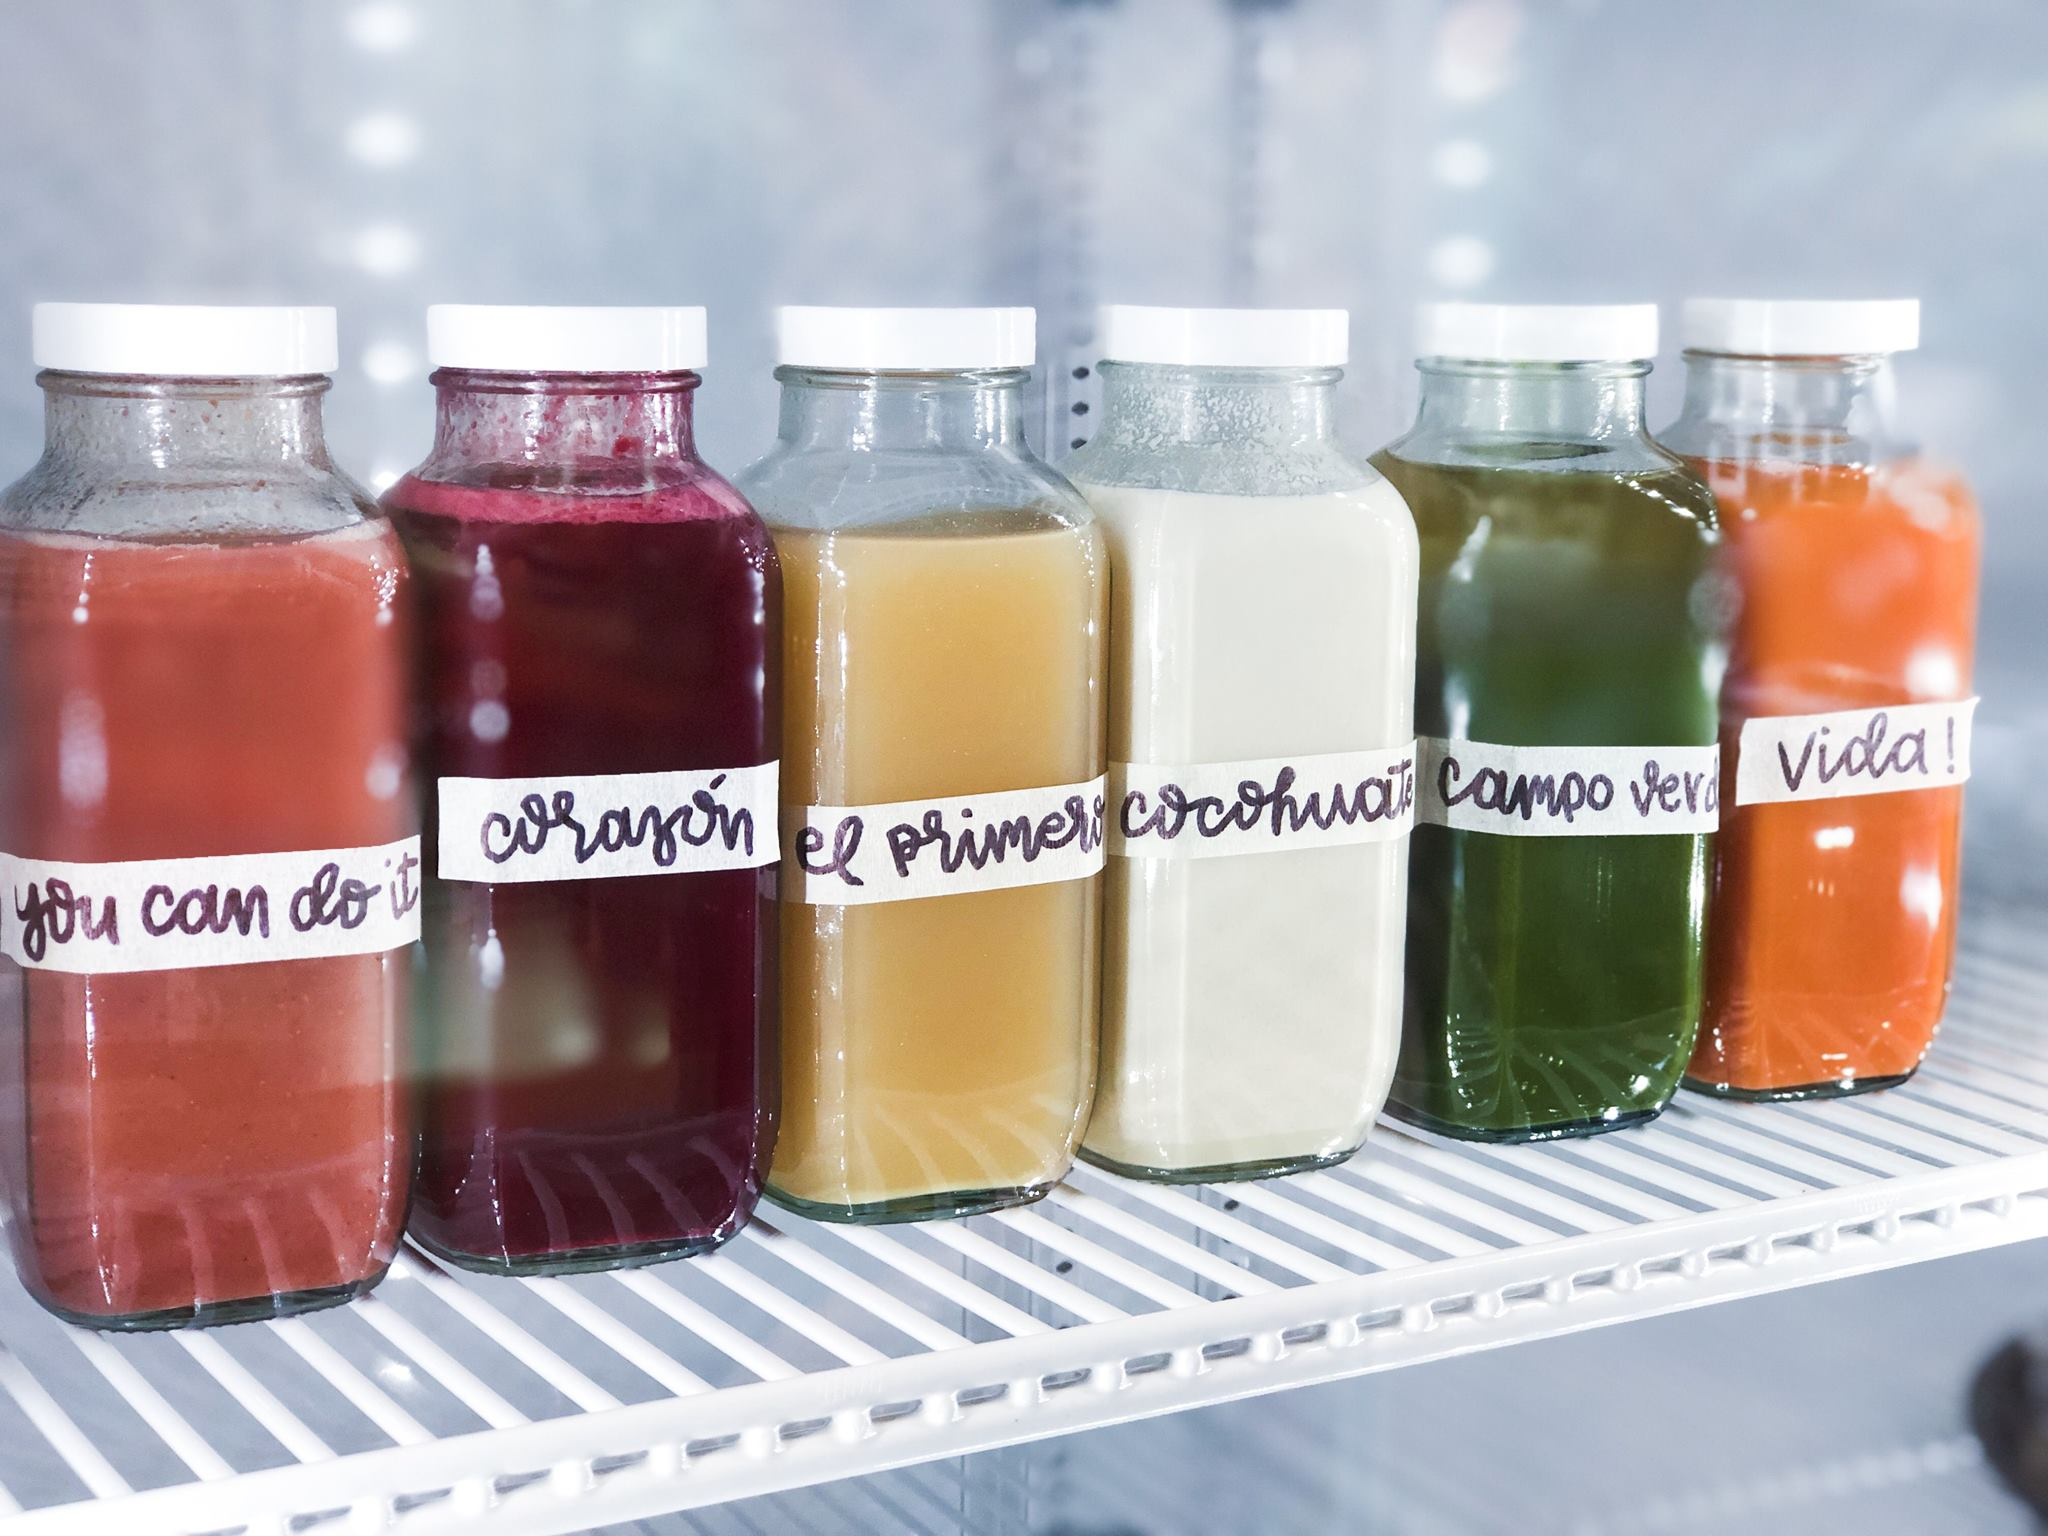 Juices from Vida Pura Juicery